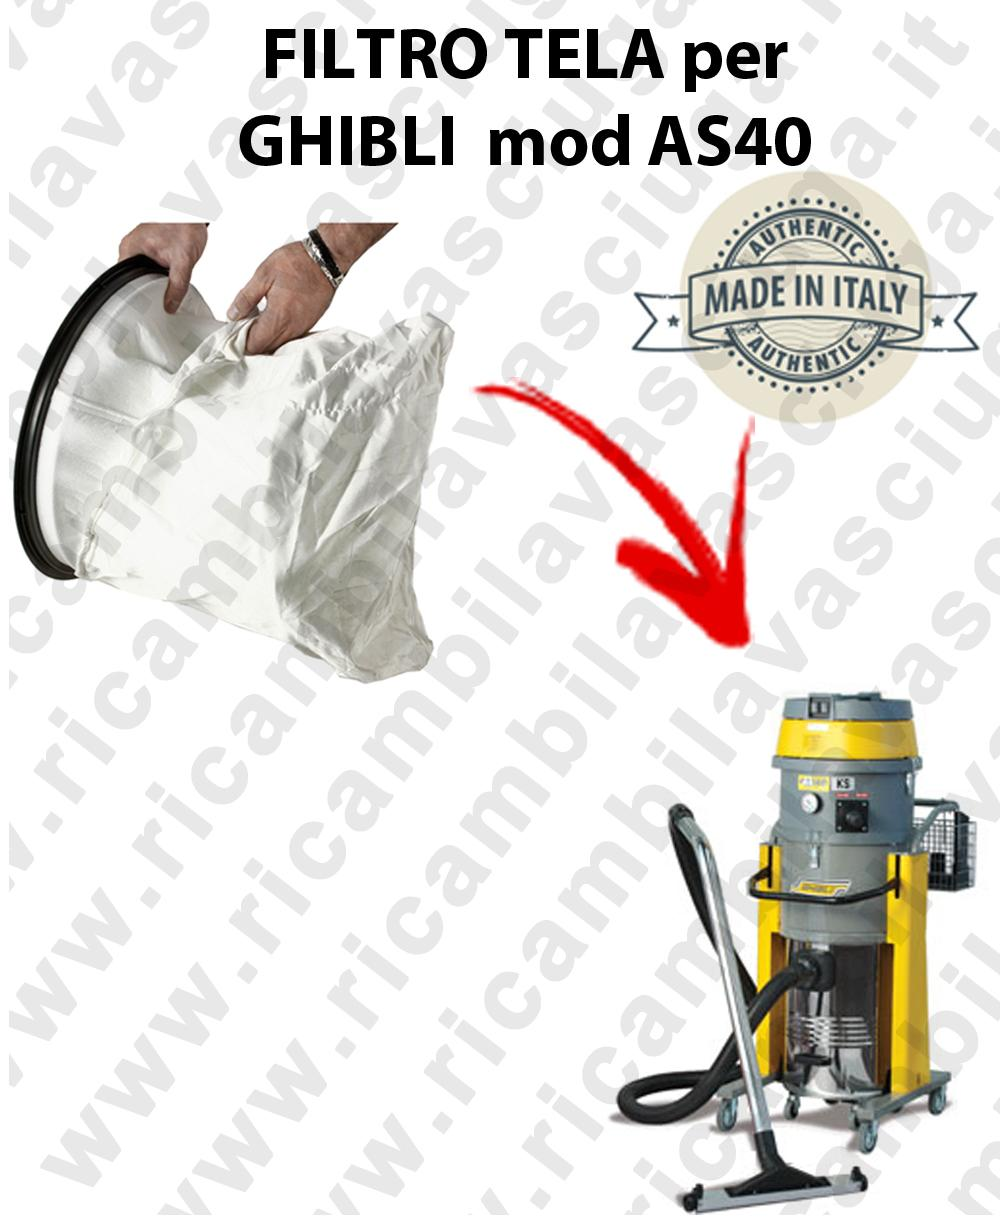 SACCO Filtro de Nylon cod: 3001220 para aspiradora GHIBLI Model AS40